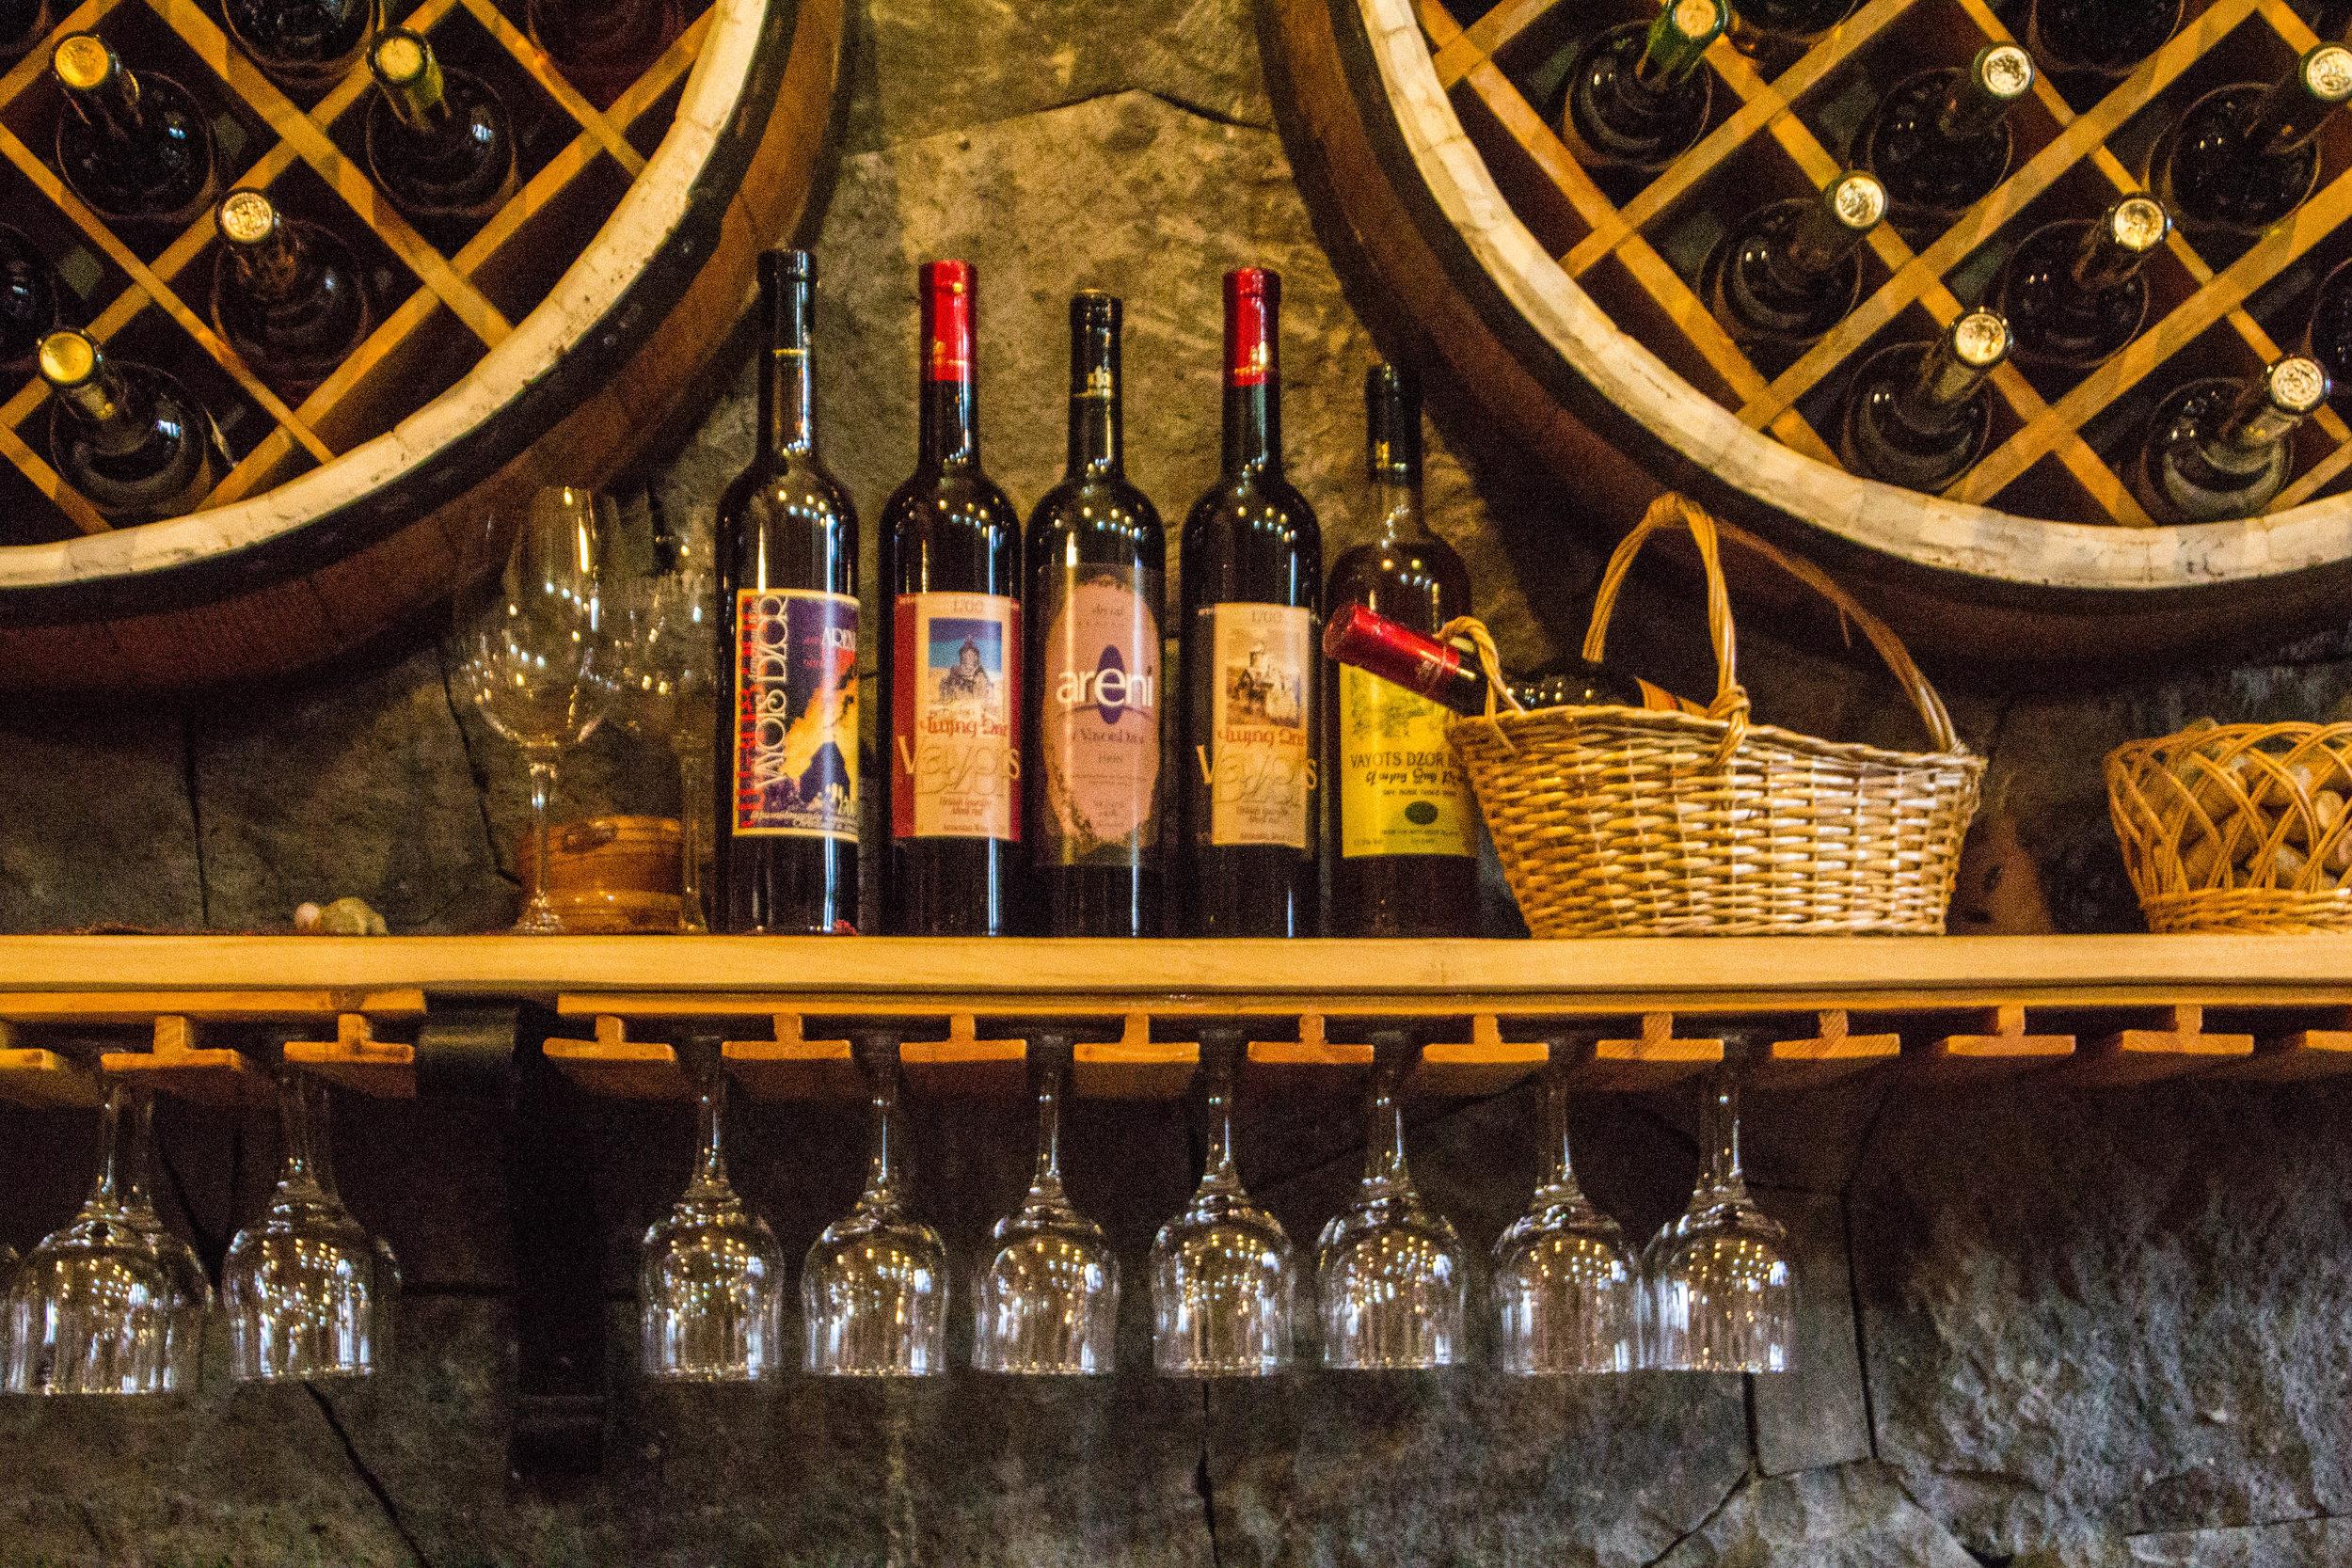 armenian-wine-tasting-8.jpg